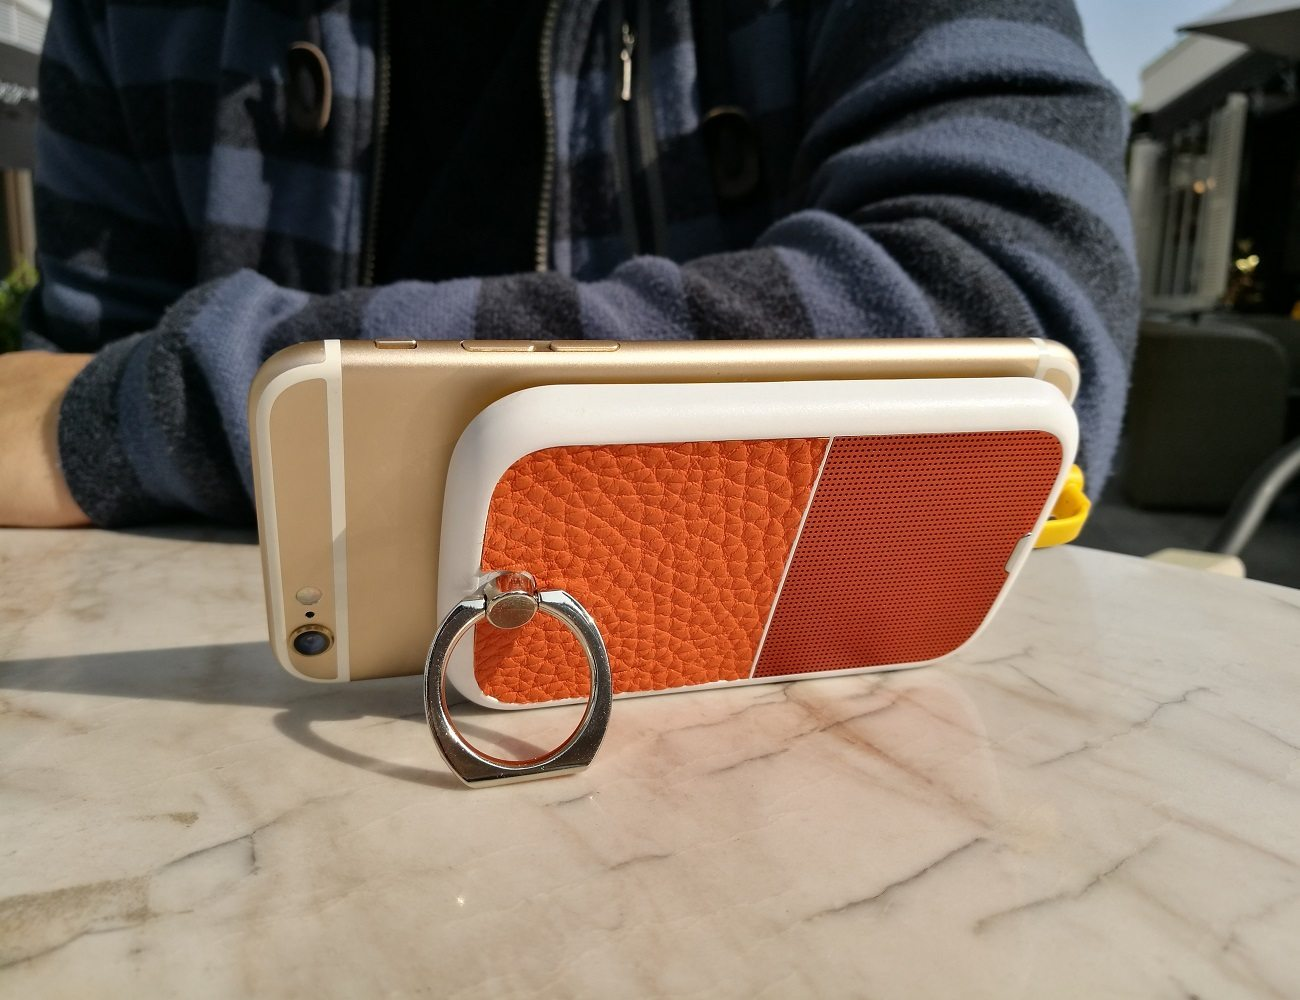 CELLO Smartphone Battery Stand